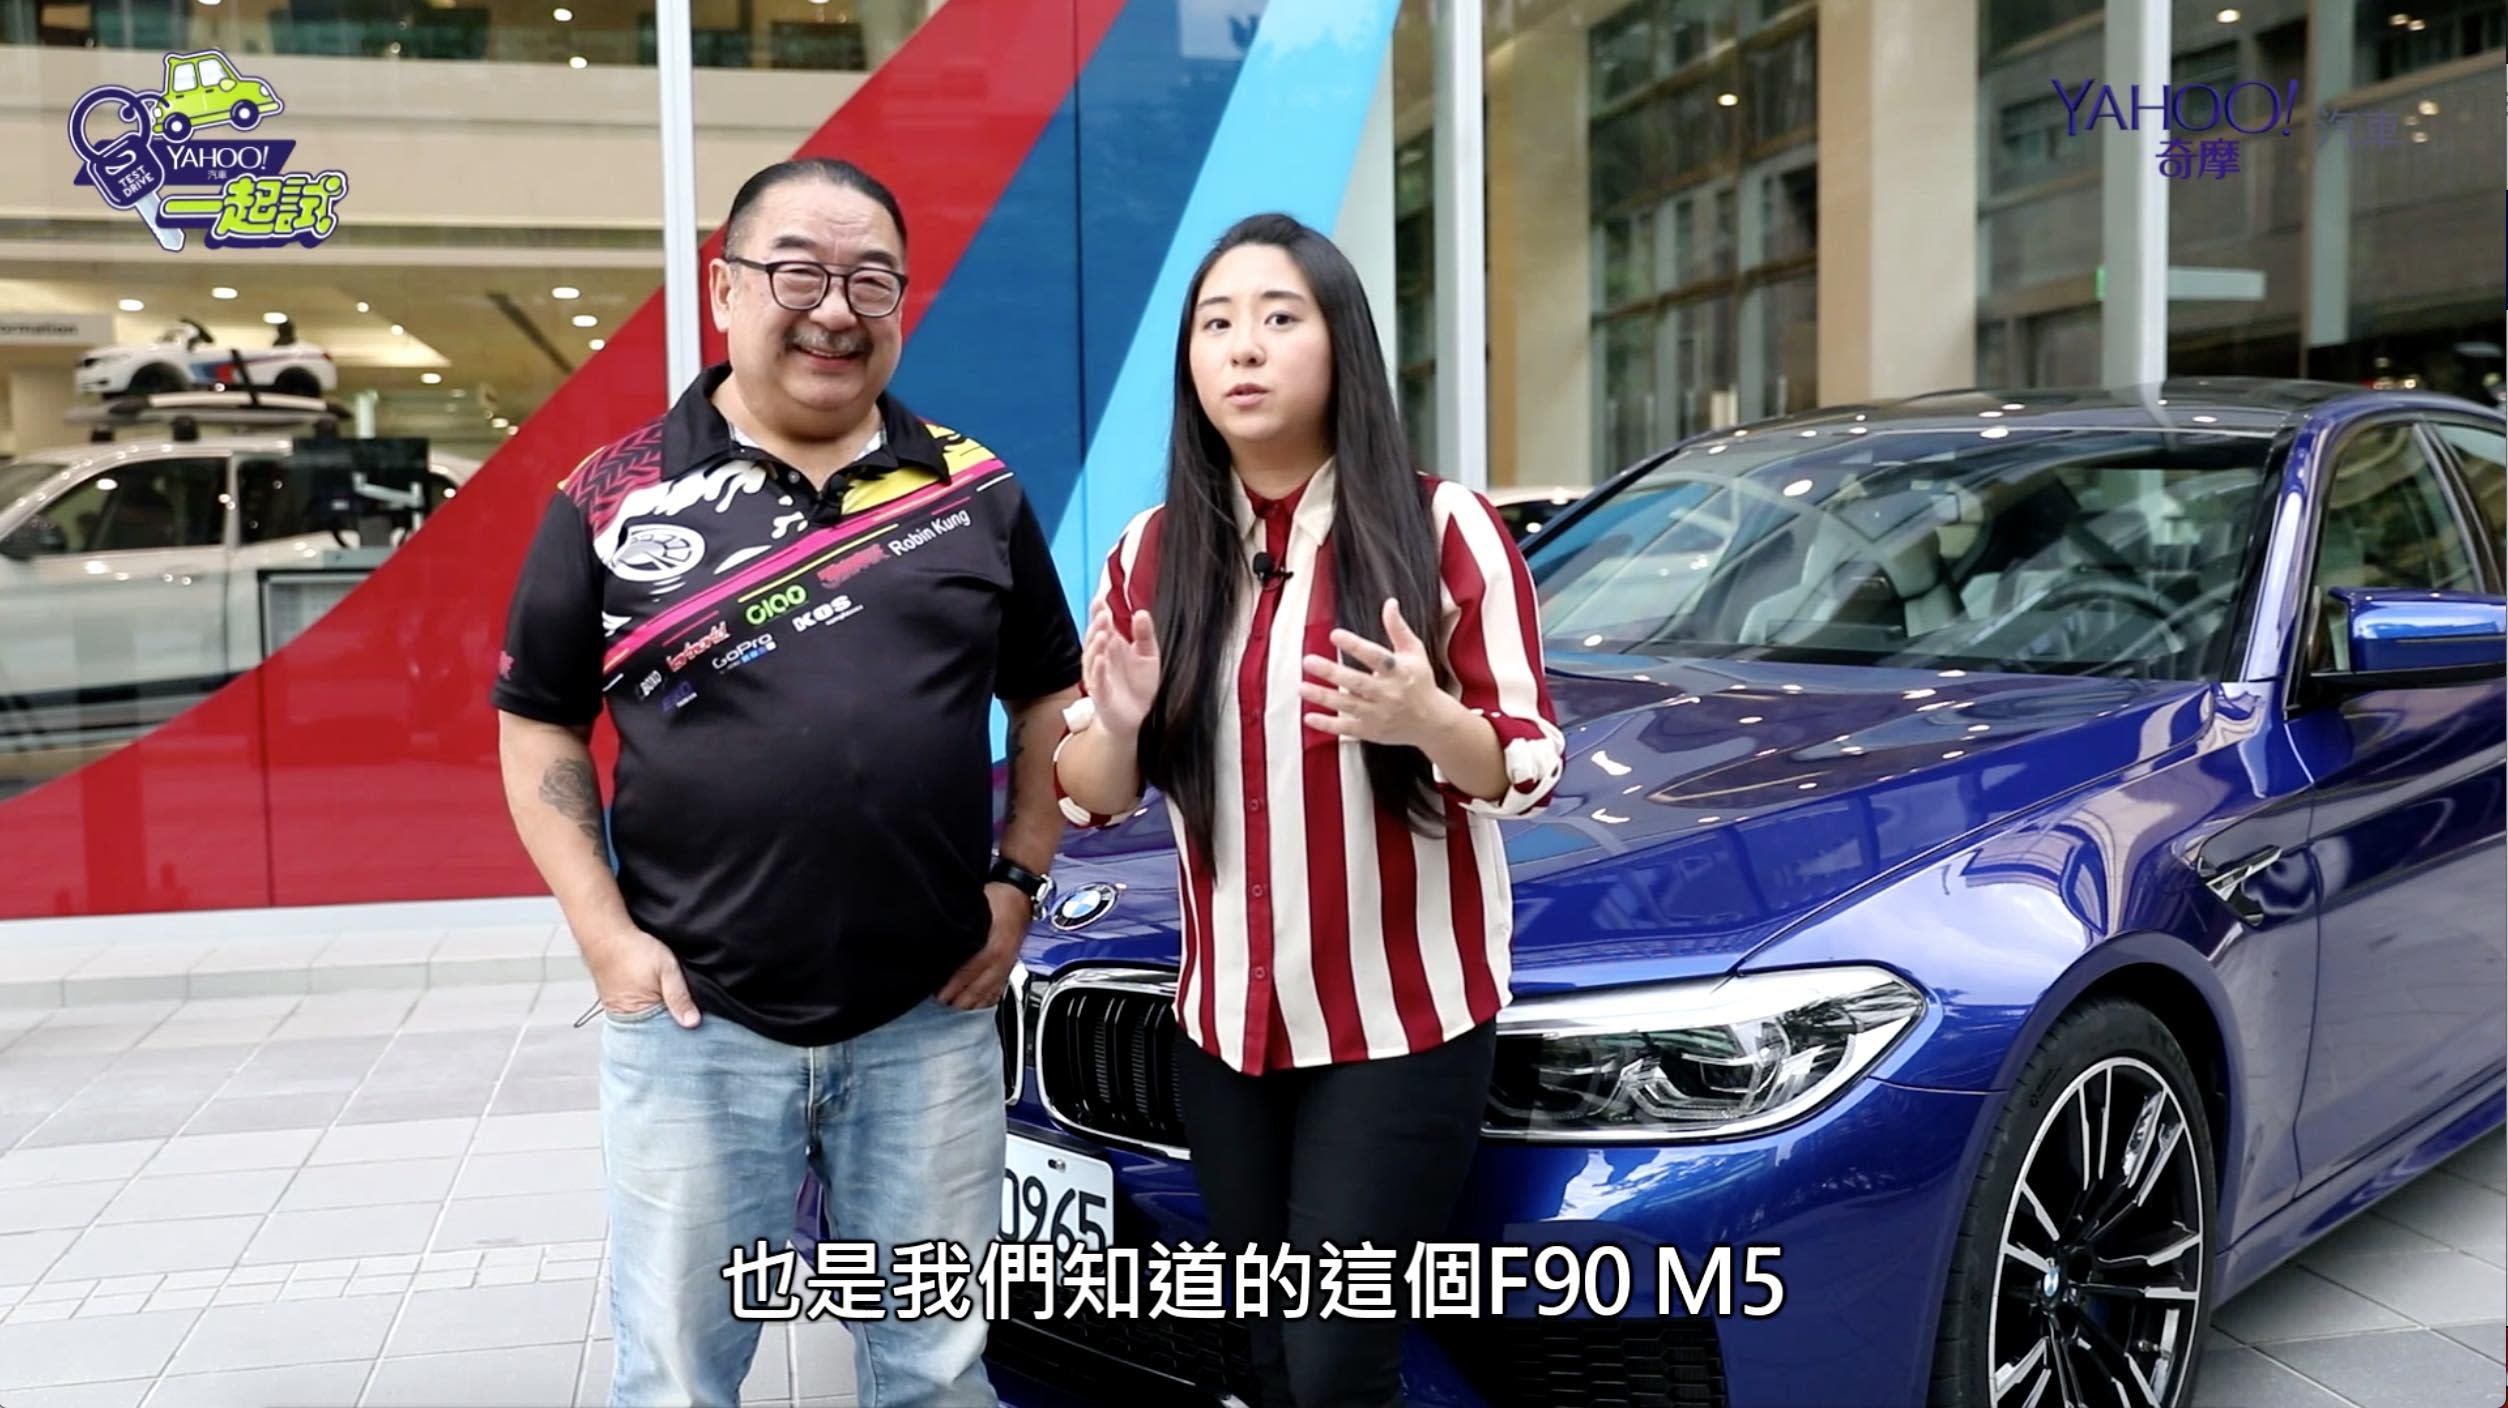 【Yahoo汽車一起試】Vol.8 BMW 史上最強 M5 重磅登場!